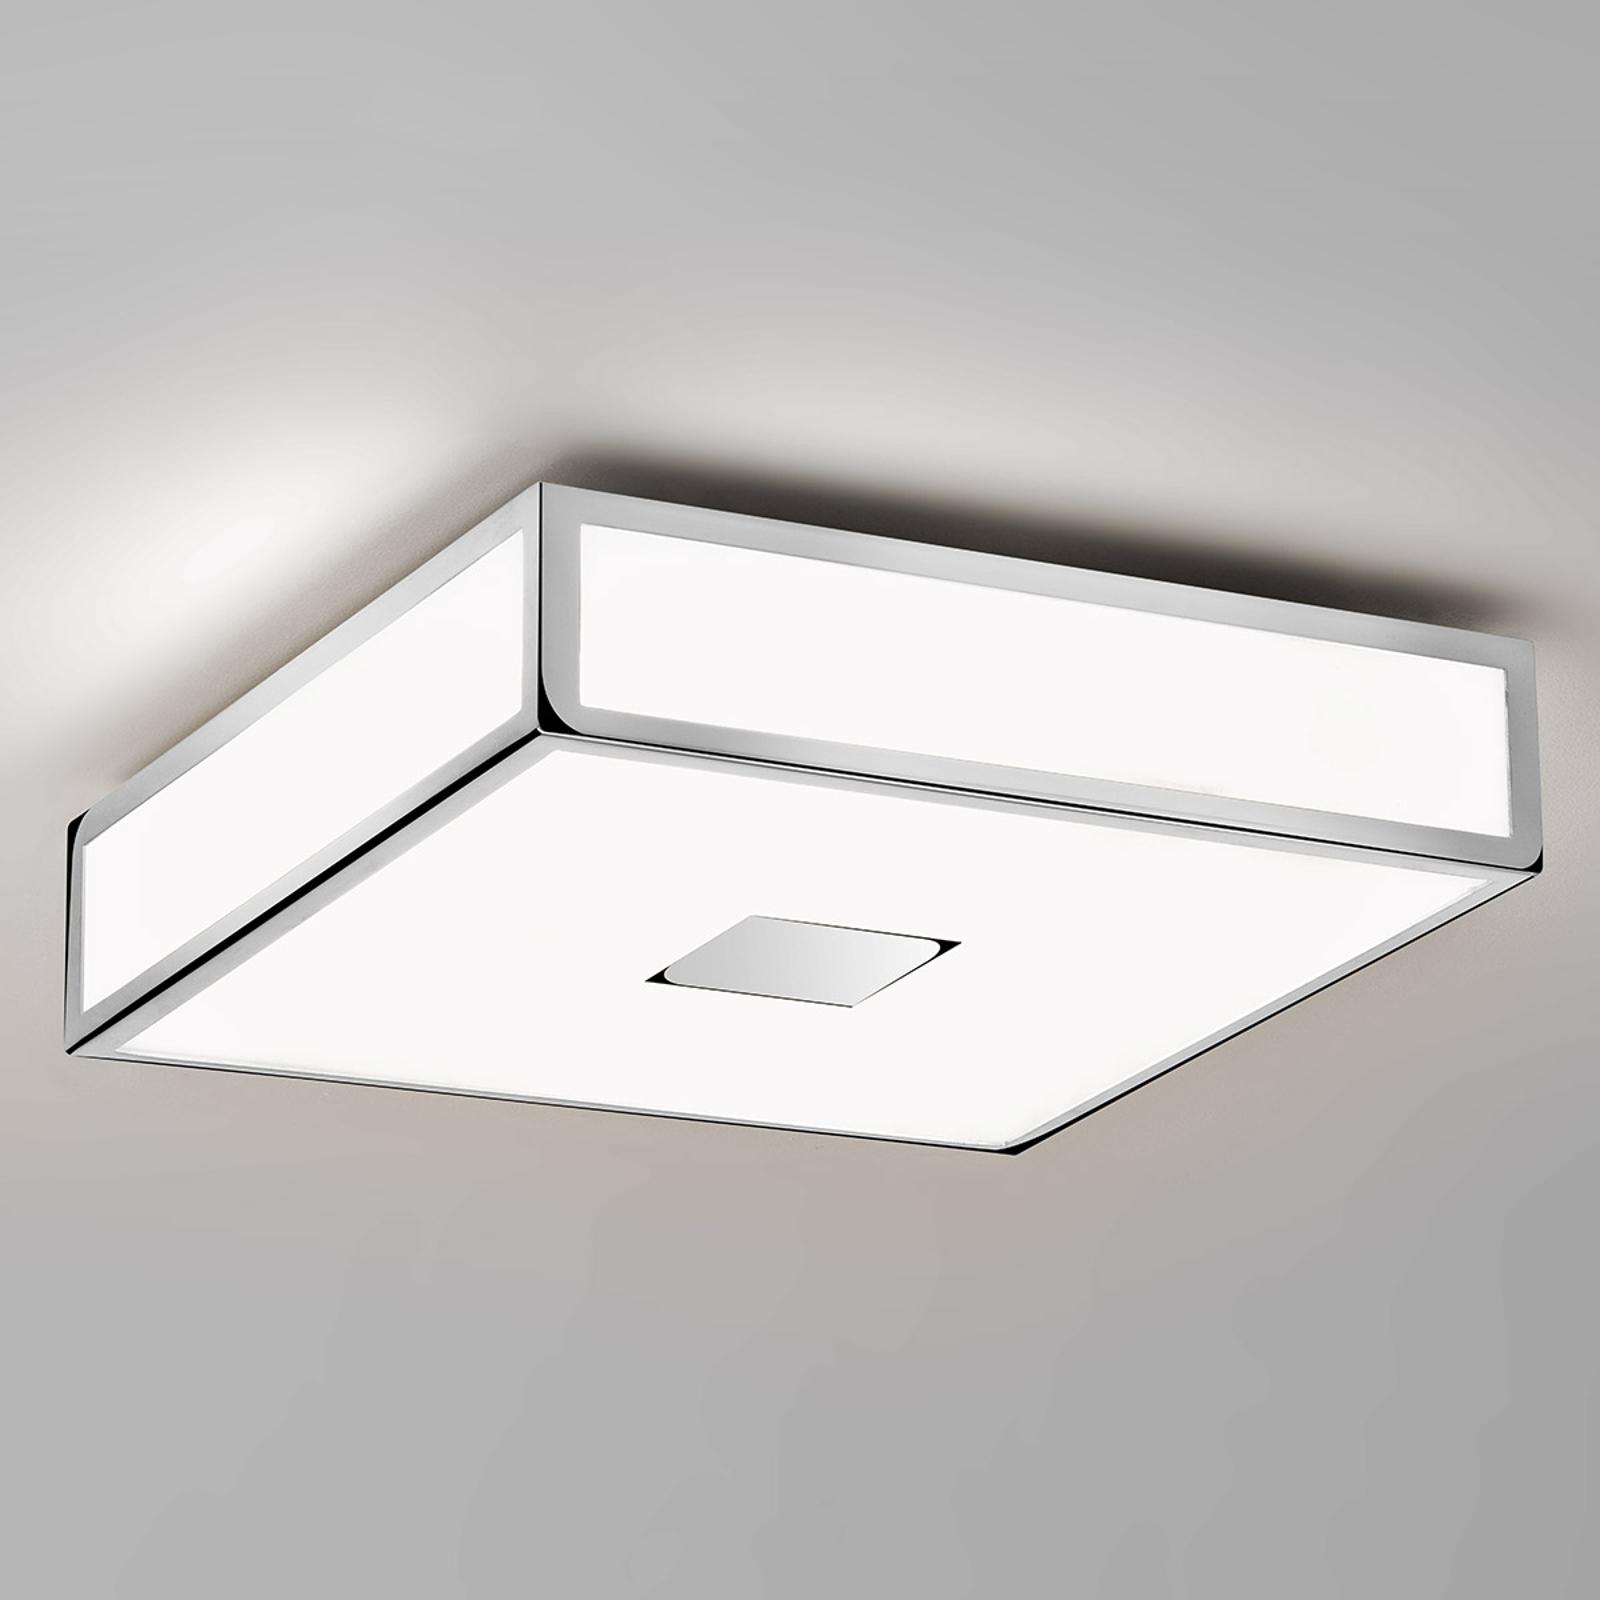 Astro Mashiko loftlampe til badeværelset 30 x 30